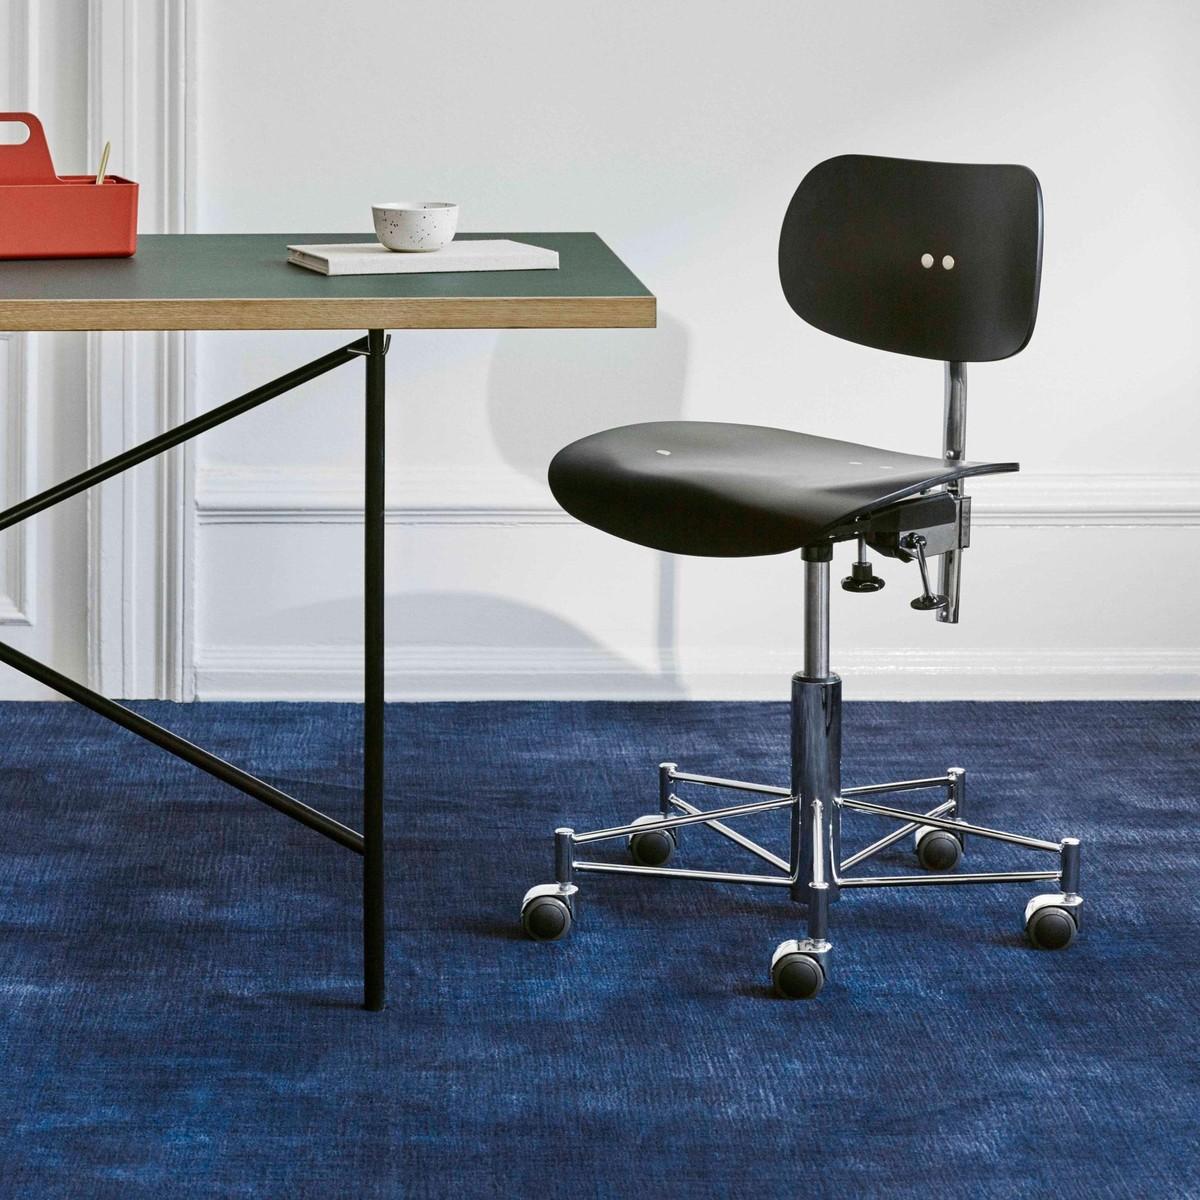 eiermann 2 tischgestell 100x66x66 richard lampert. Black Bedroom Furniture Sets. Home Design Ideas